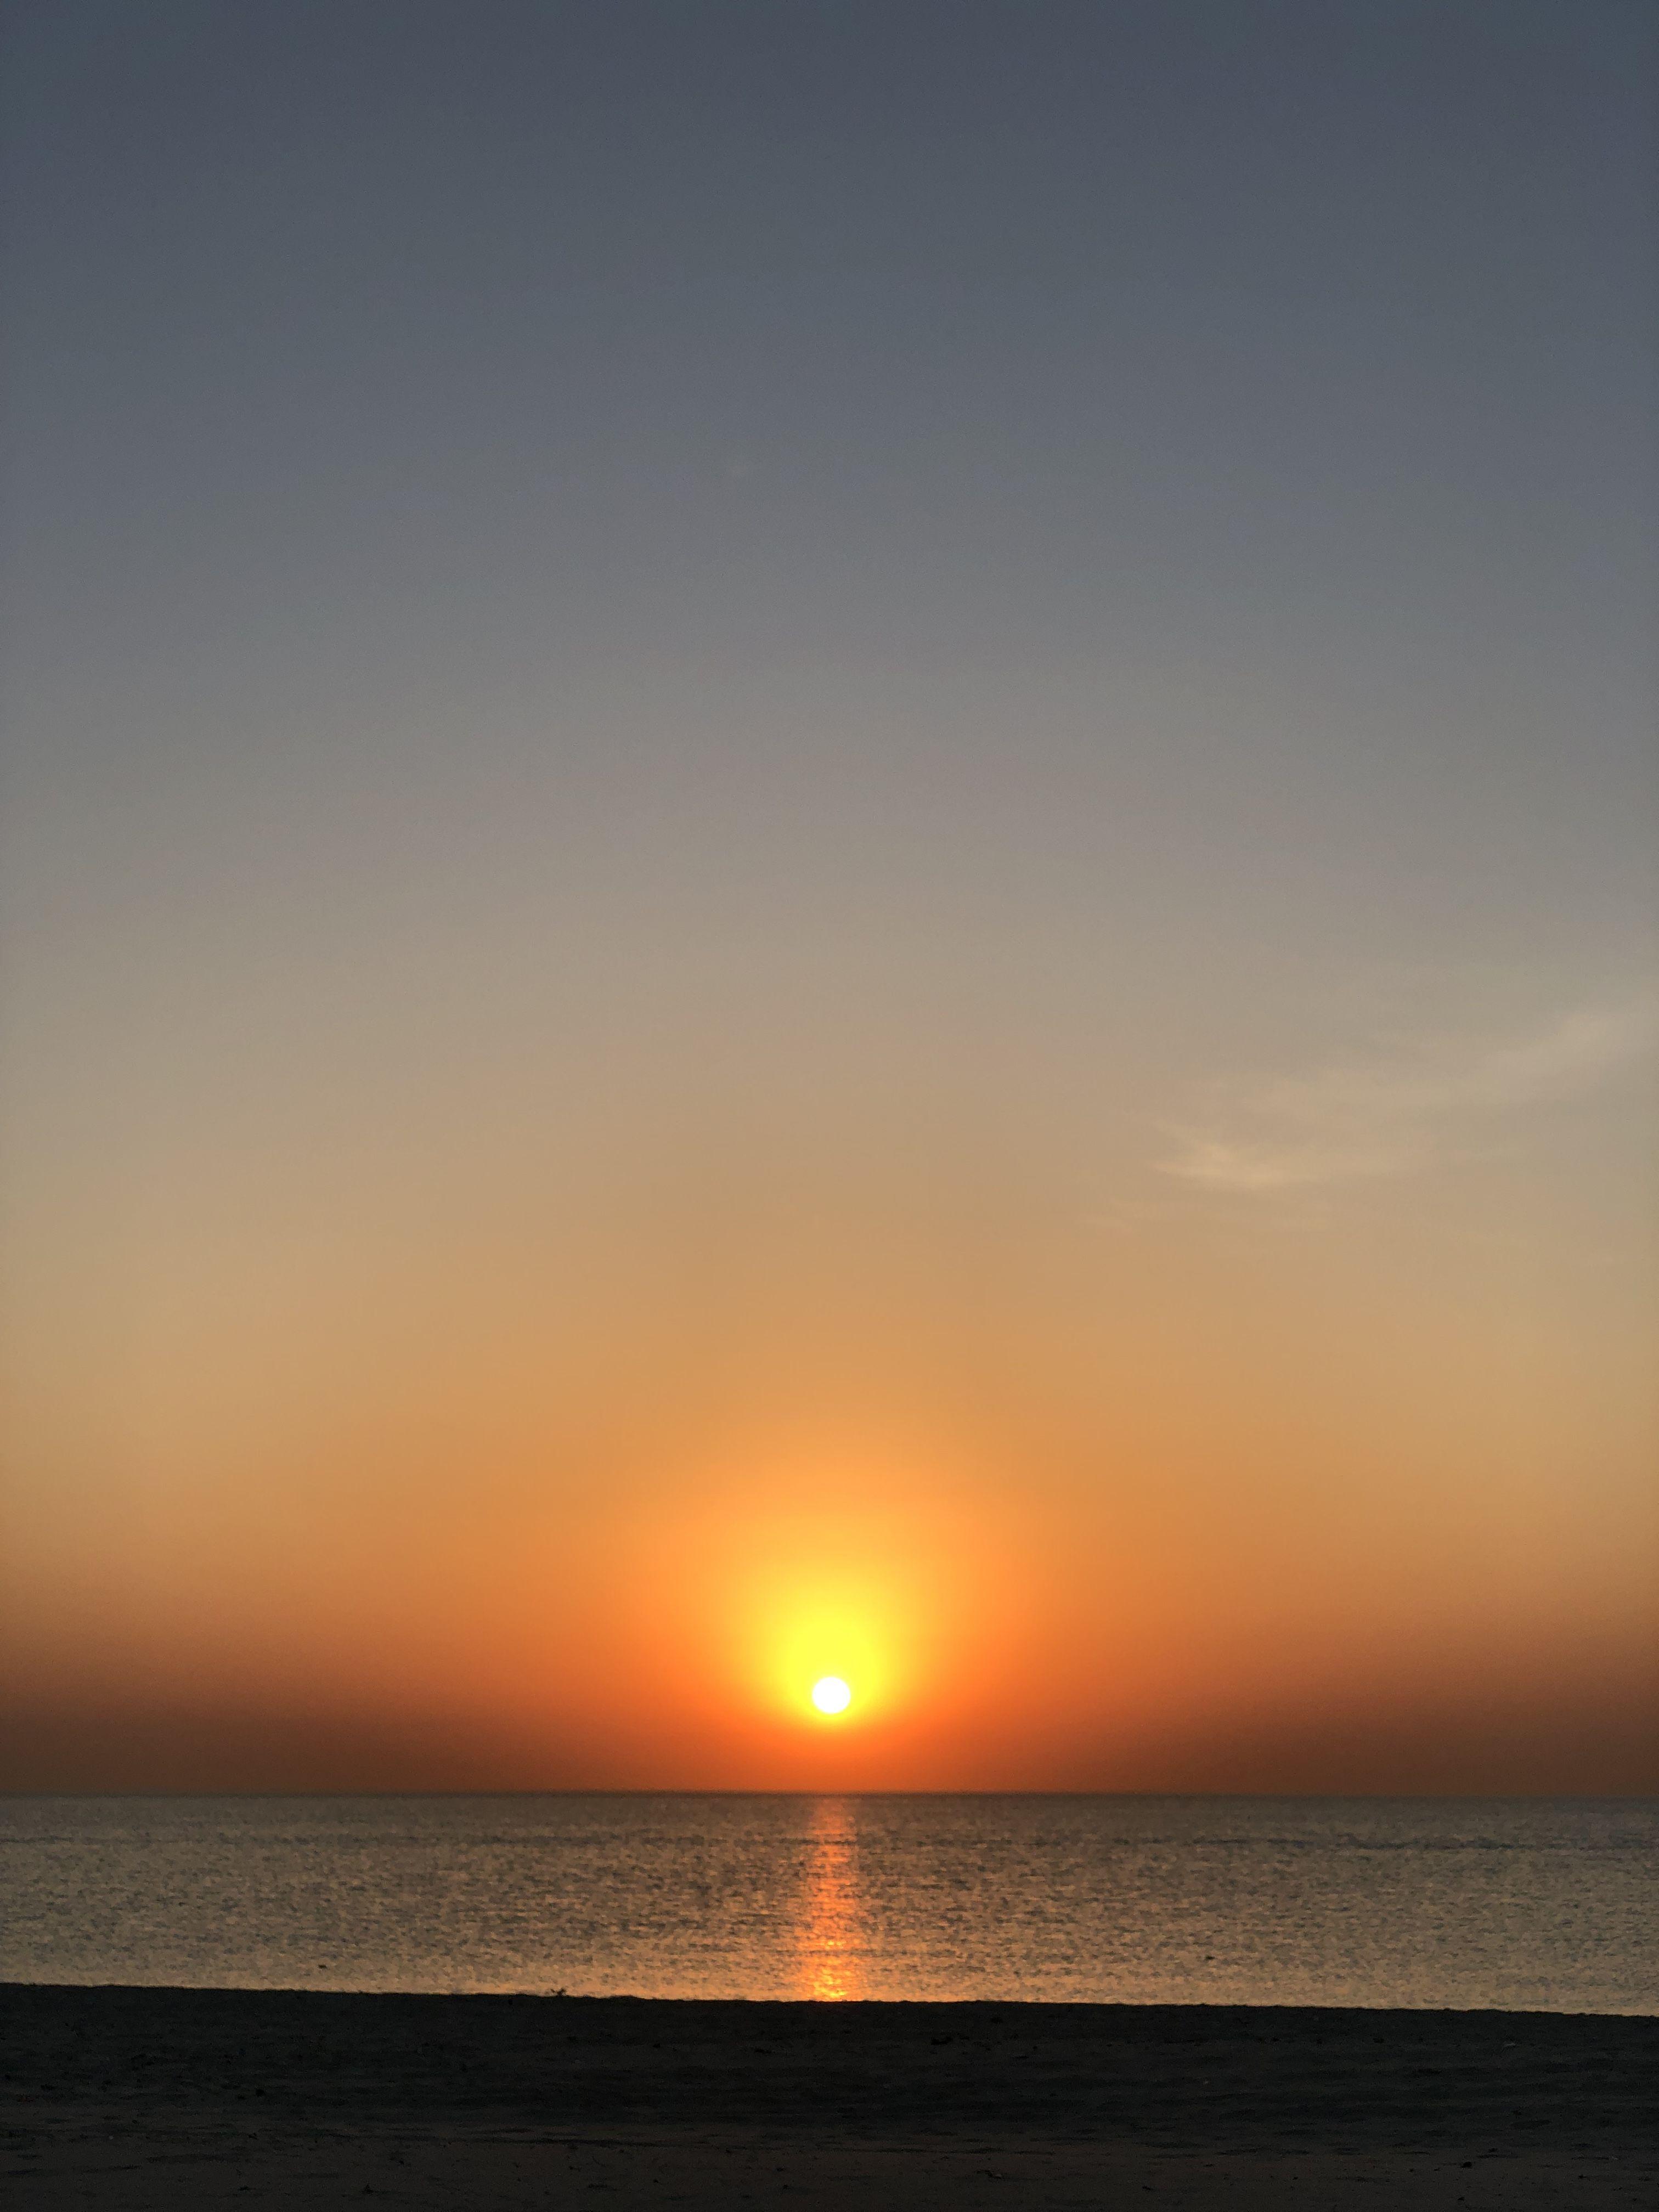 Pin By Asma Alholi On شروق الشمس Body Sun Celestial